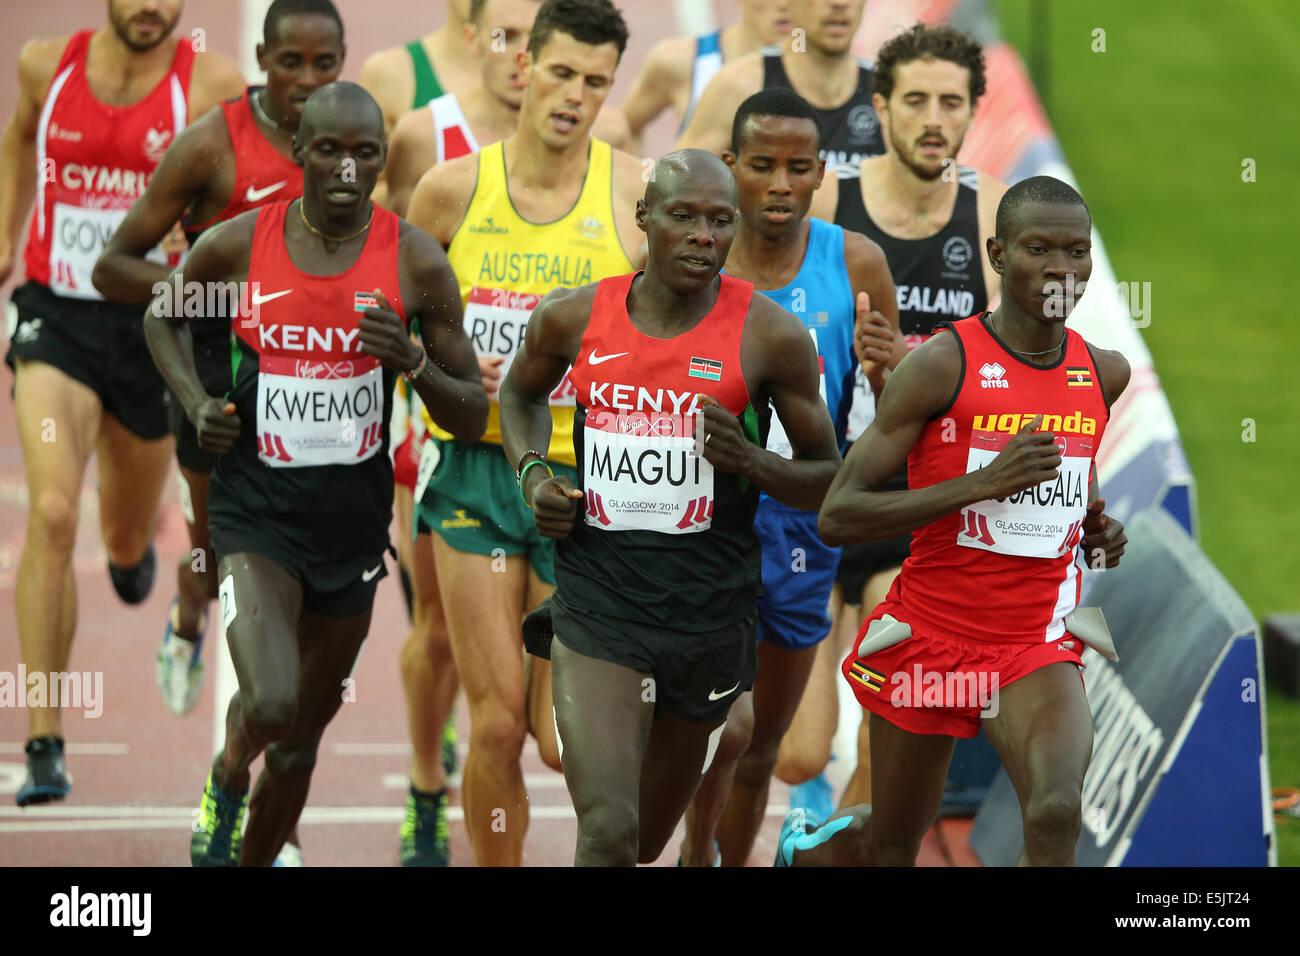 Hampden Park Glasgow 2 August 2014. Commonwealth Games day 10 Athletics.  Men's 1500m final. Winner James Kiplagat - Stock Image